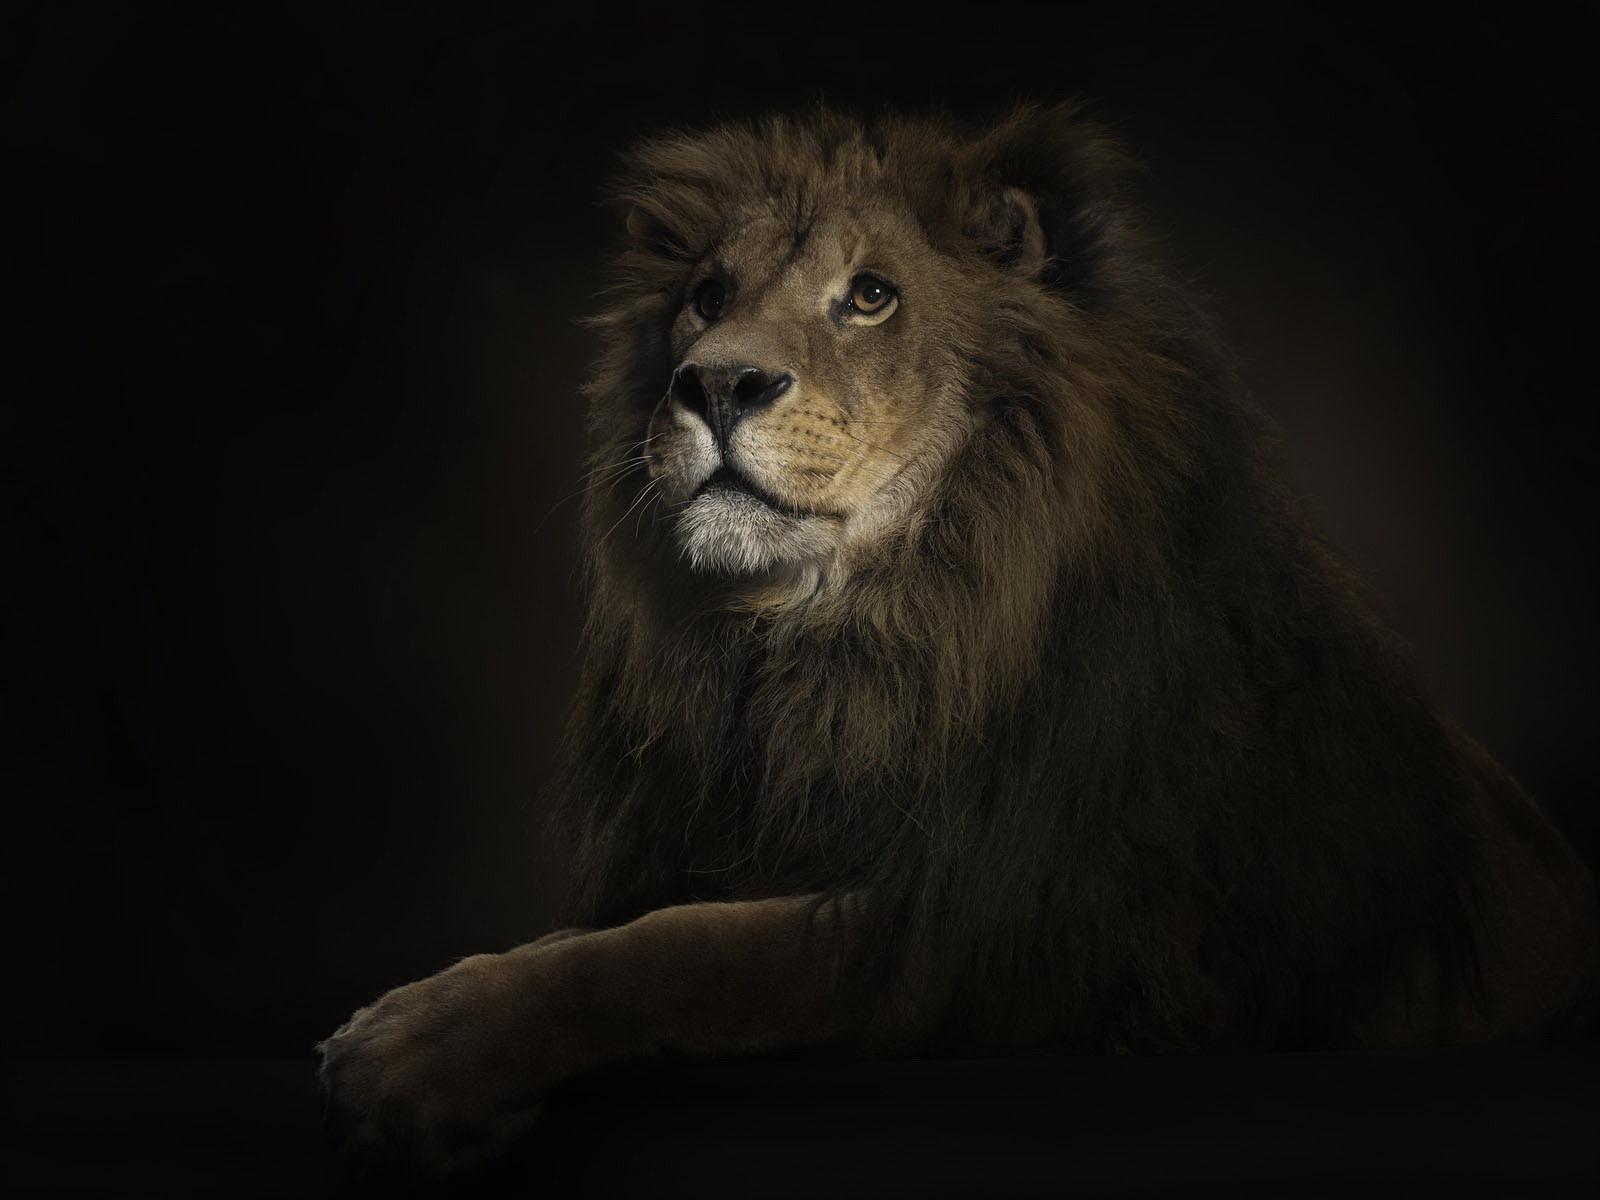 Dionne Beard: lion king hd